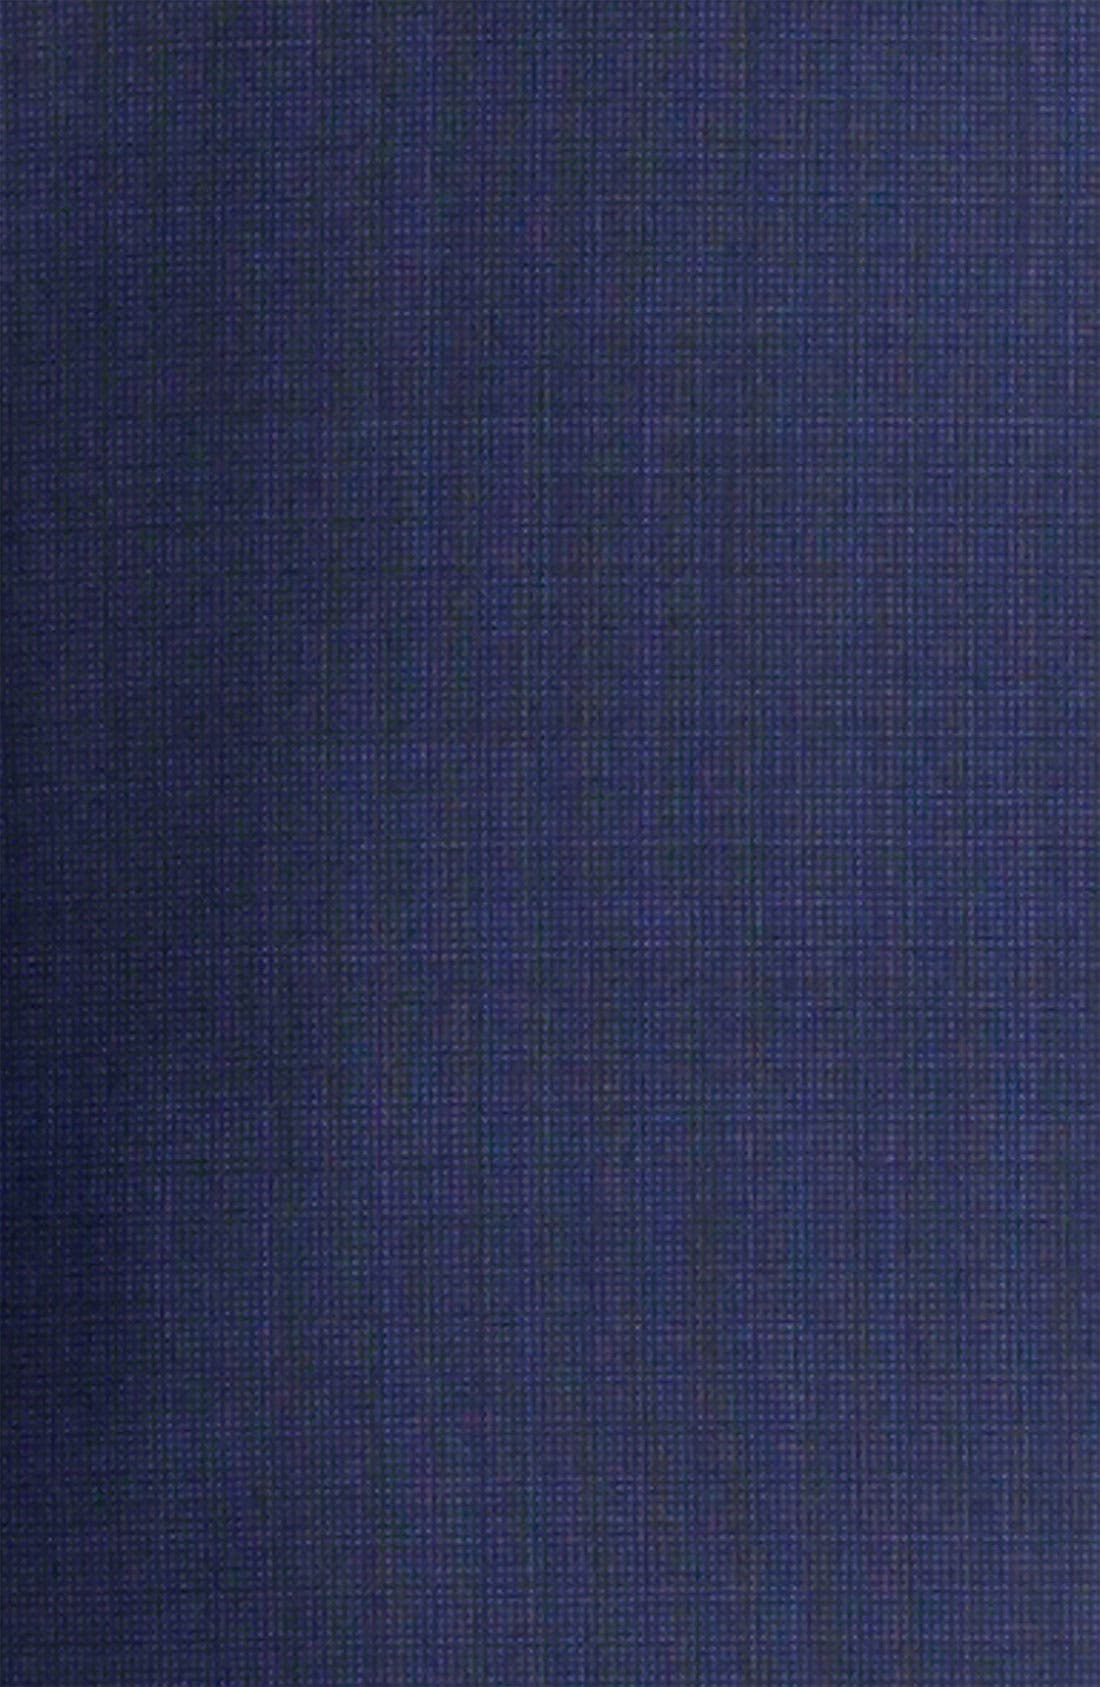 Alternate Image 2  - Z Zegna Trim Fit Wool Blend Suit